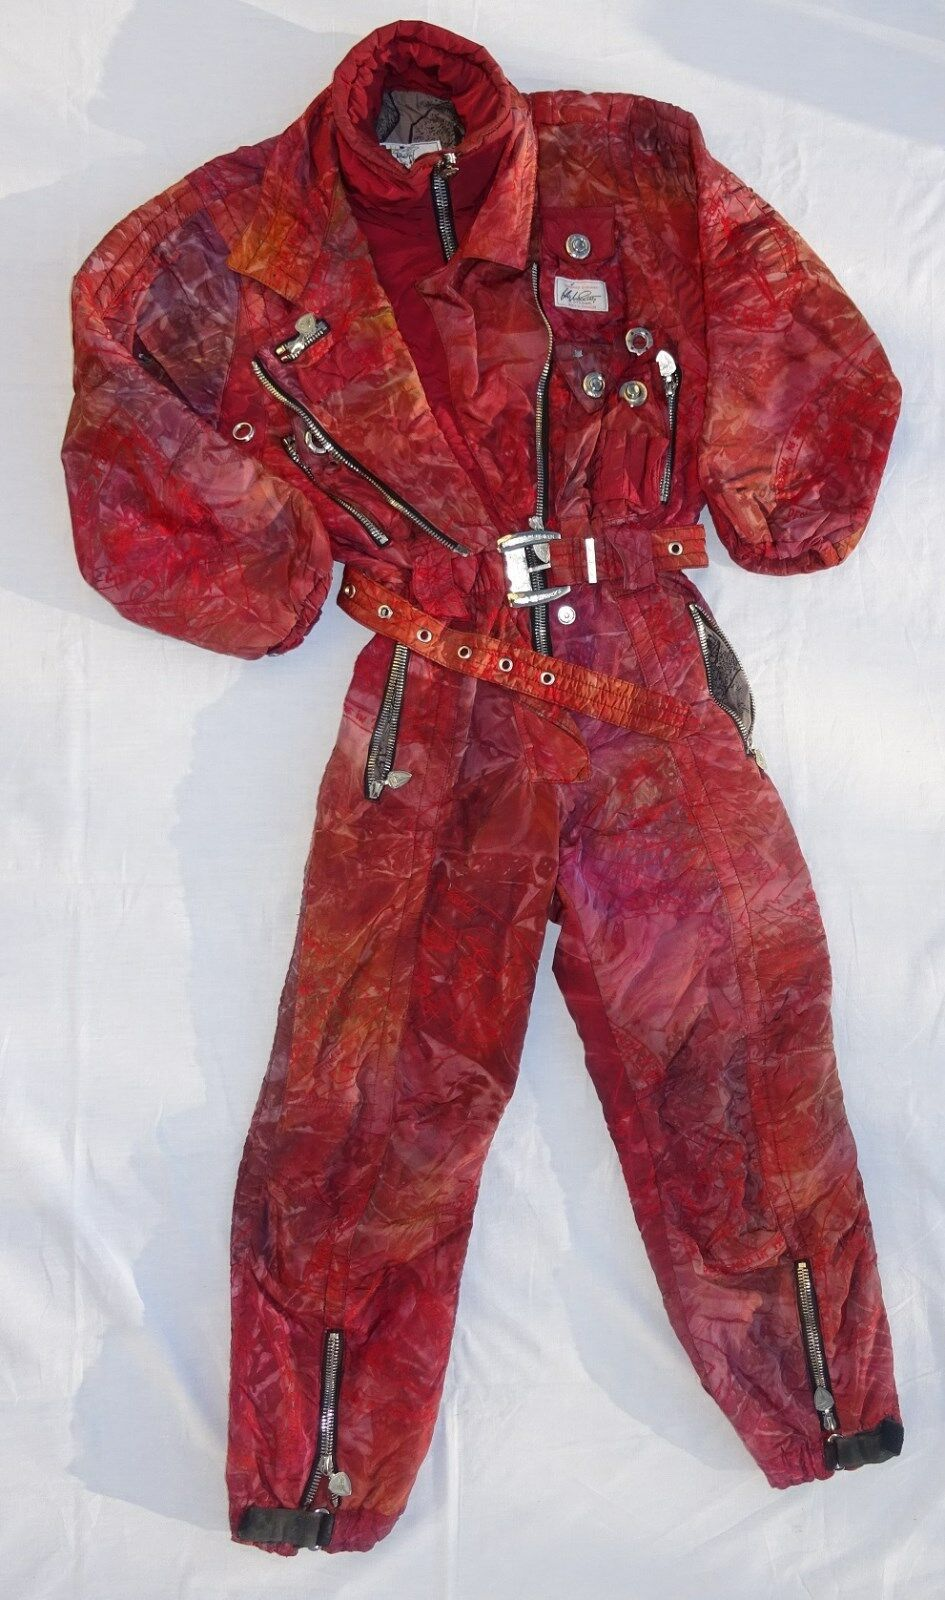 High Society Damen Skianzug Overall rot  Größe 36 36 36  R. Engel 2f8004